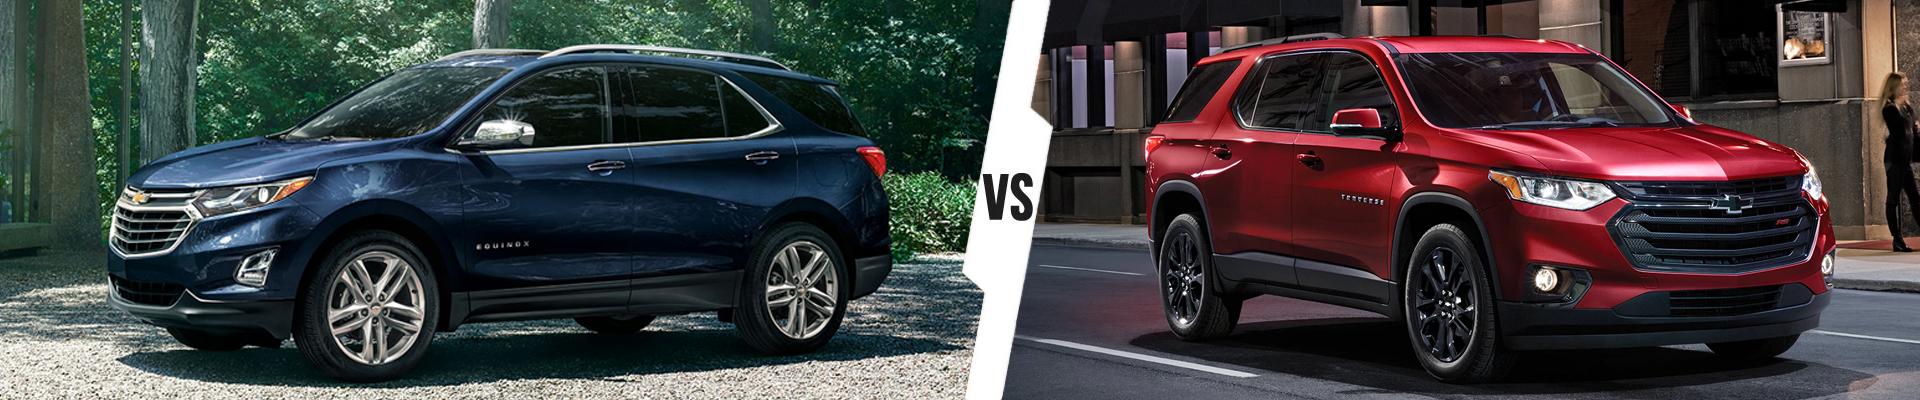 Chevrolet SUV Comparison: 2021 Chevrolet Equinox Versus 2020 Chevrolet Traverse